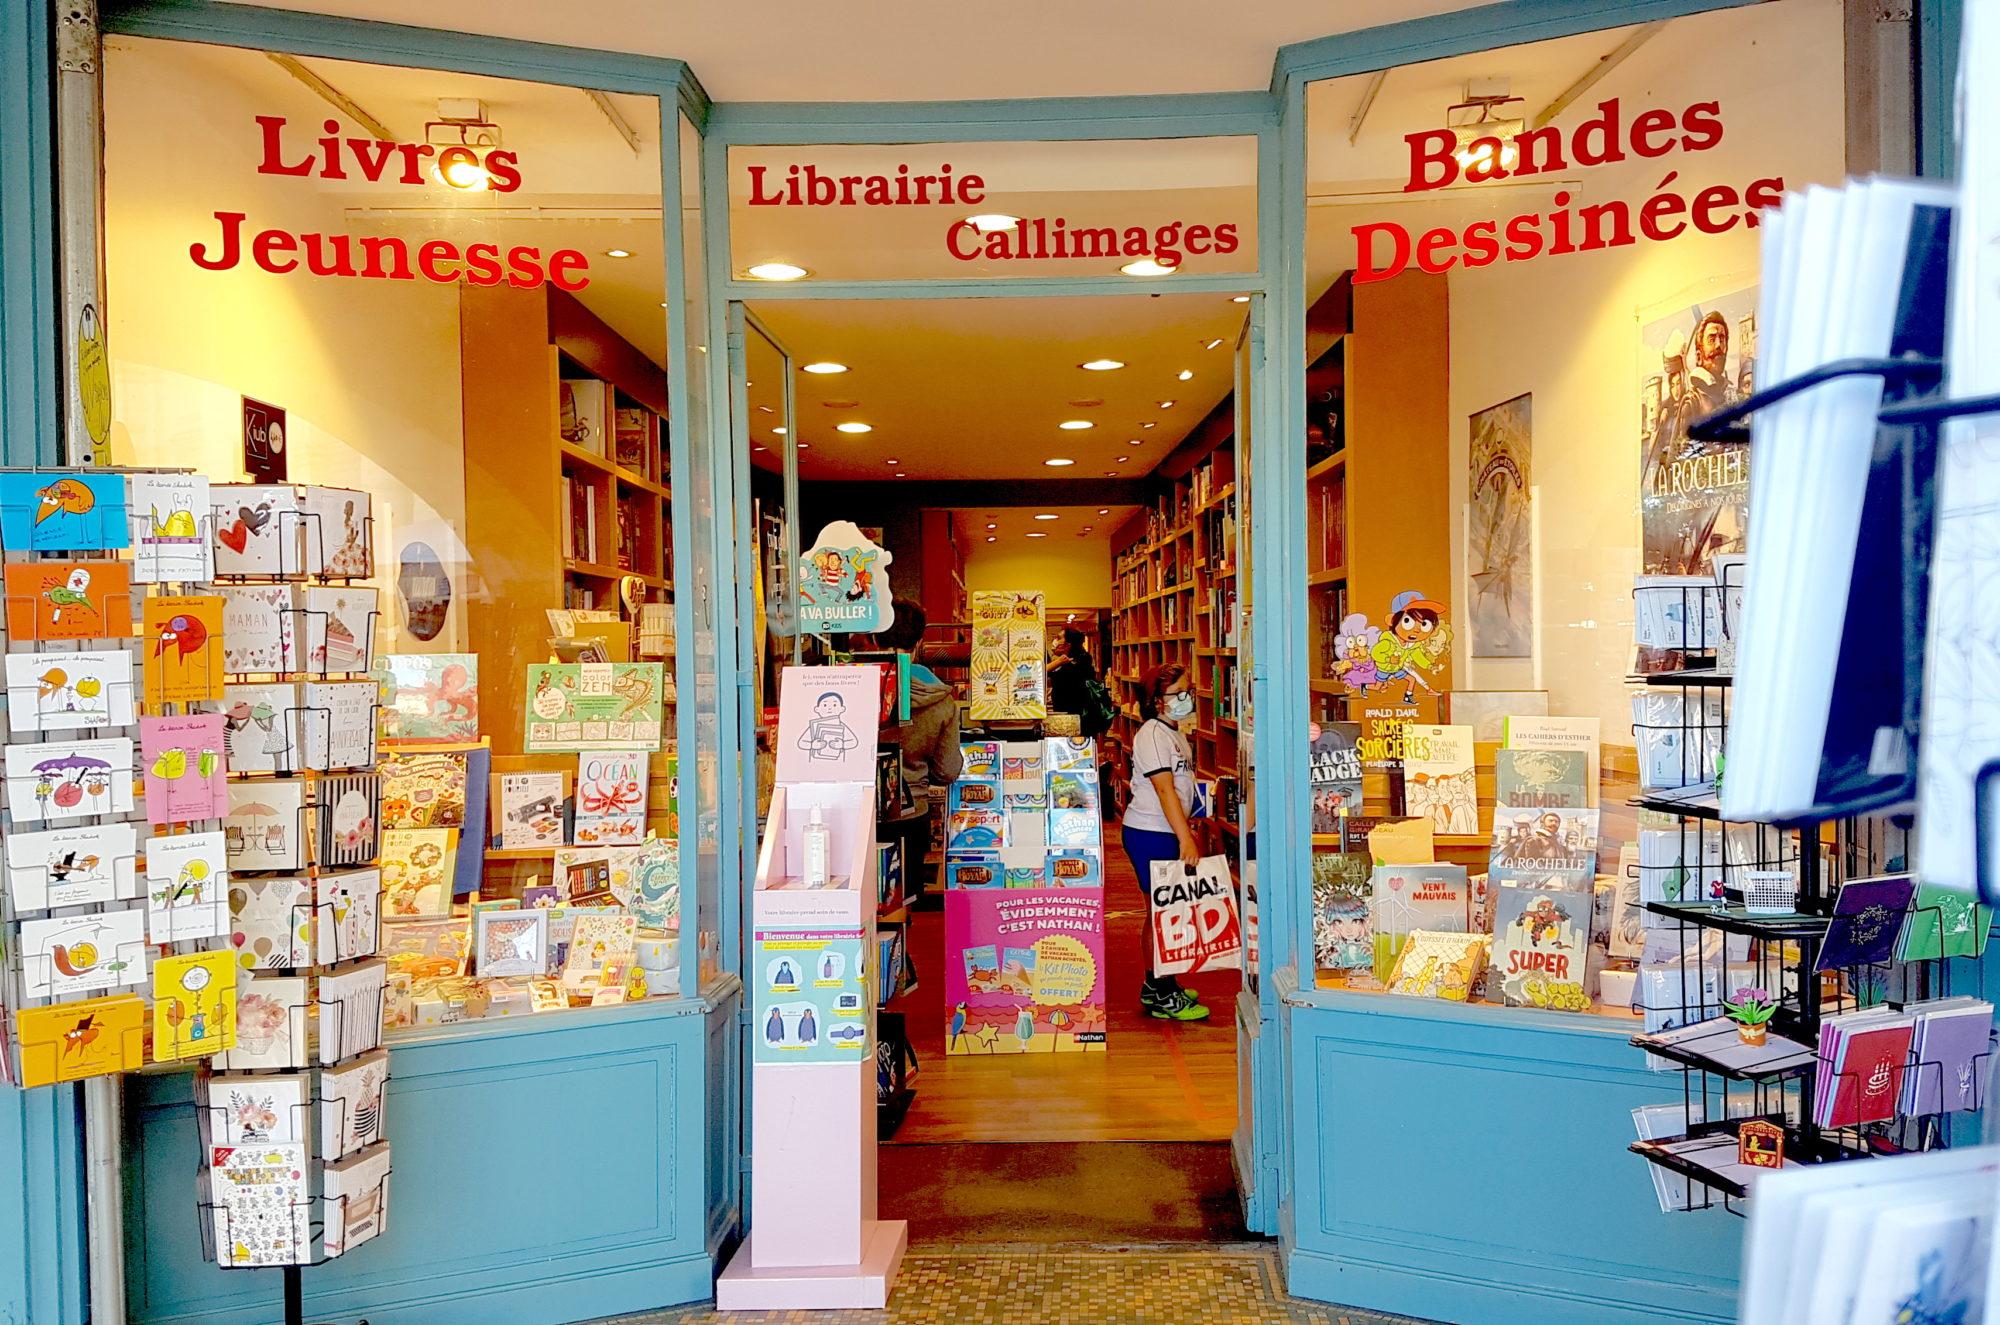 librairie callimages